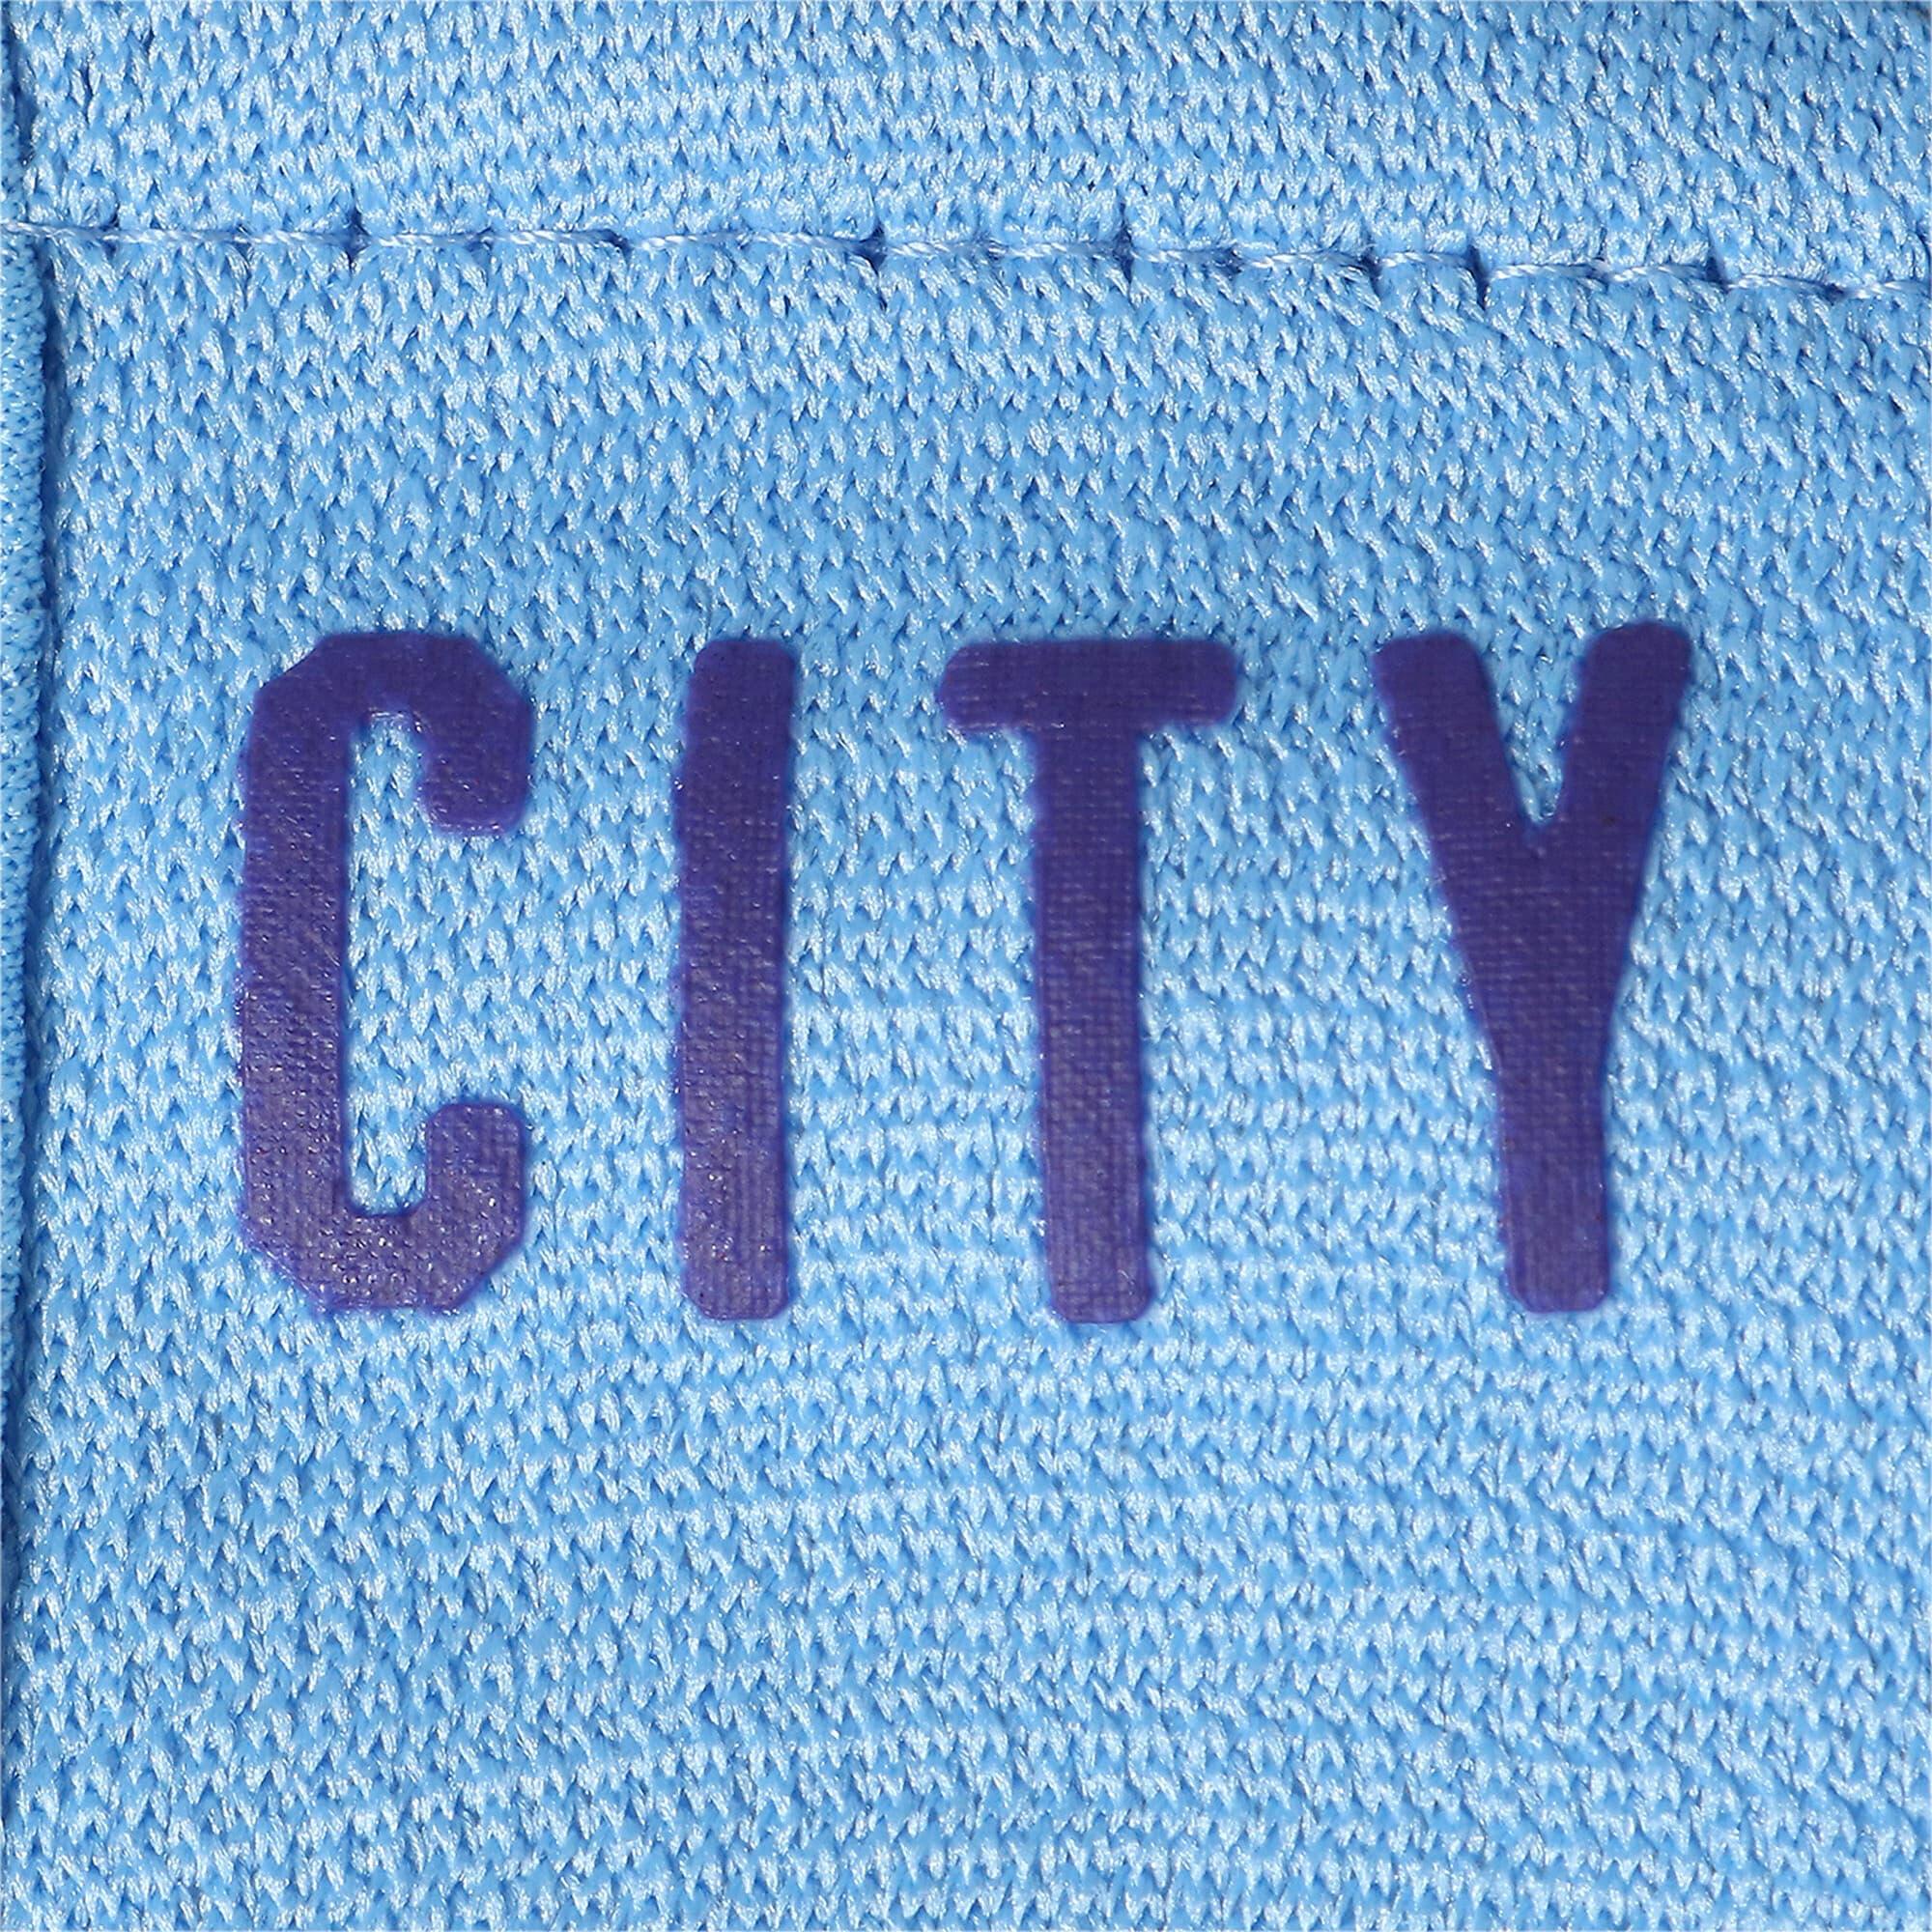 Thumbnail 11 of マンチェスター・シティ MCFC SS ホーム レプリカシャツ 半袖, TeamLightBlue-TillandsiaPurp, medium-JPN